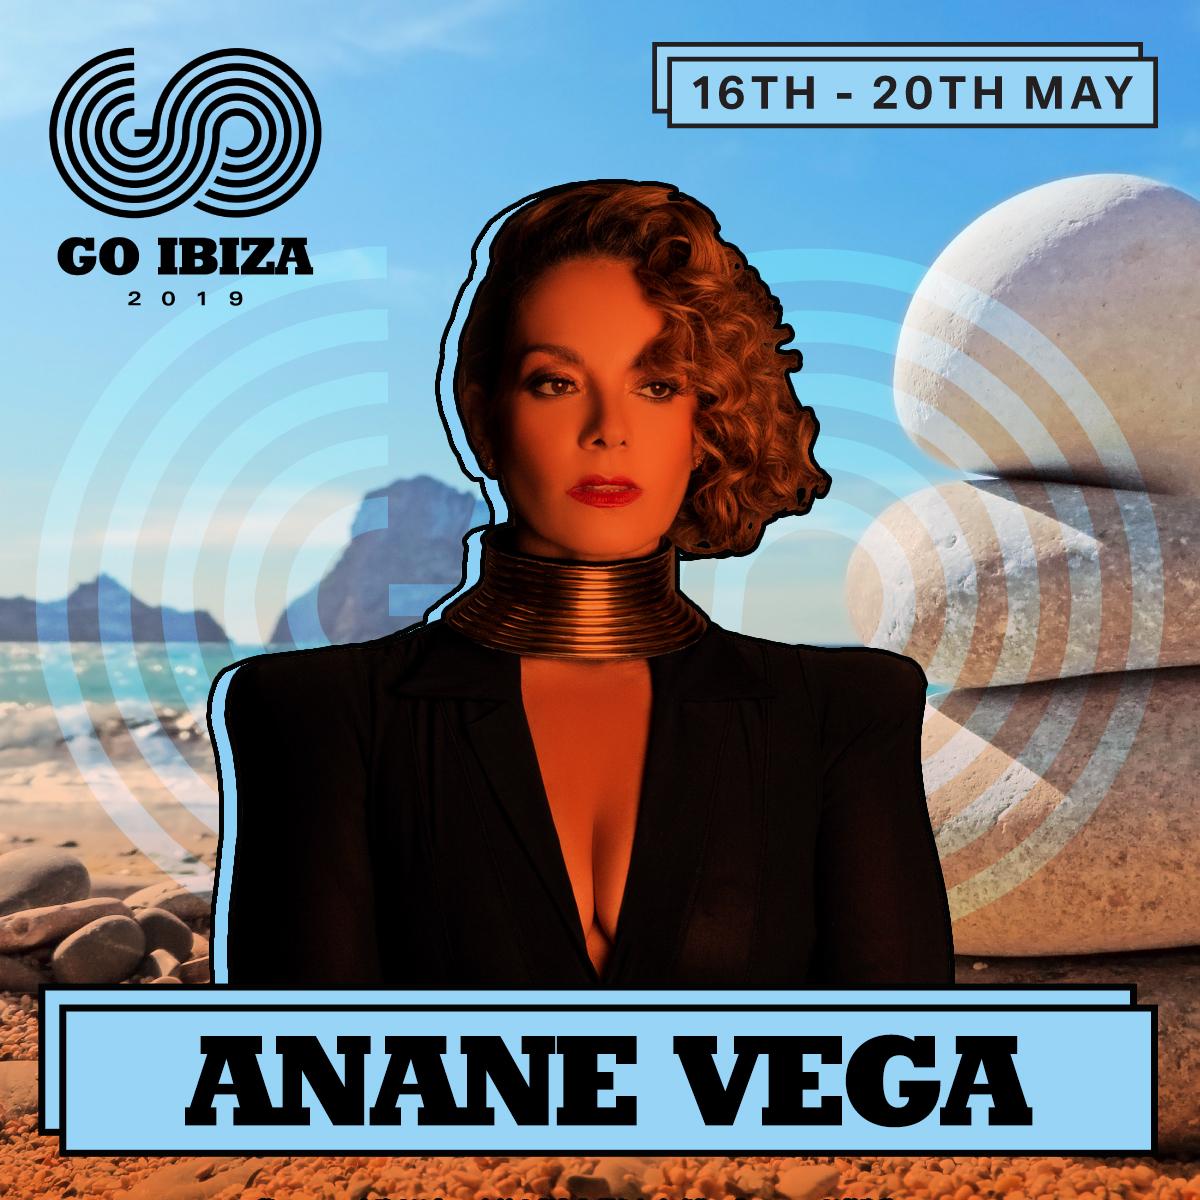 49_GO_ArtistCardTemplate_Anane-Vega